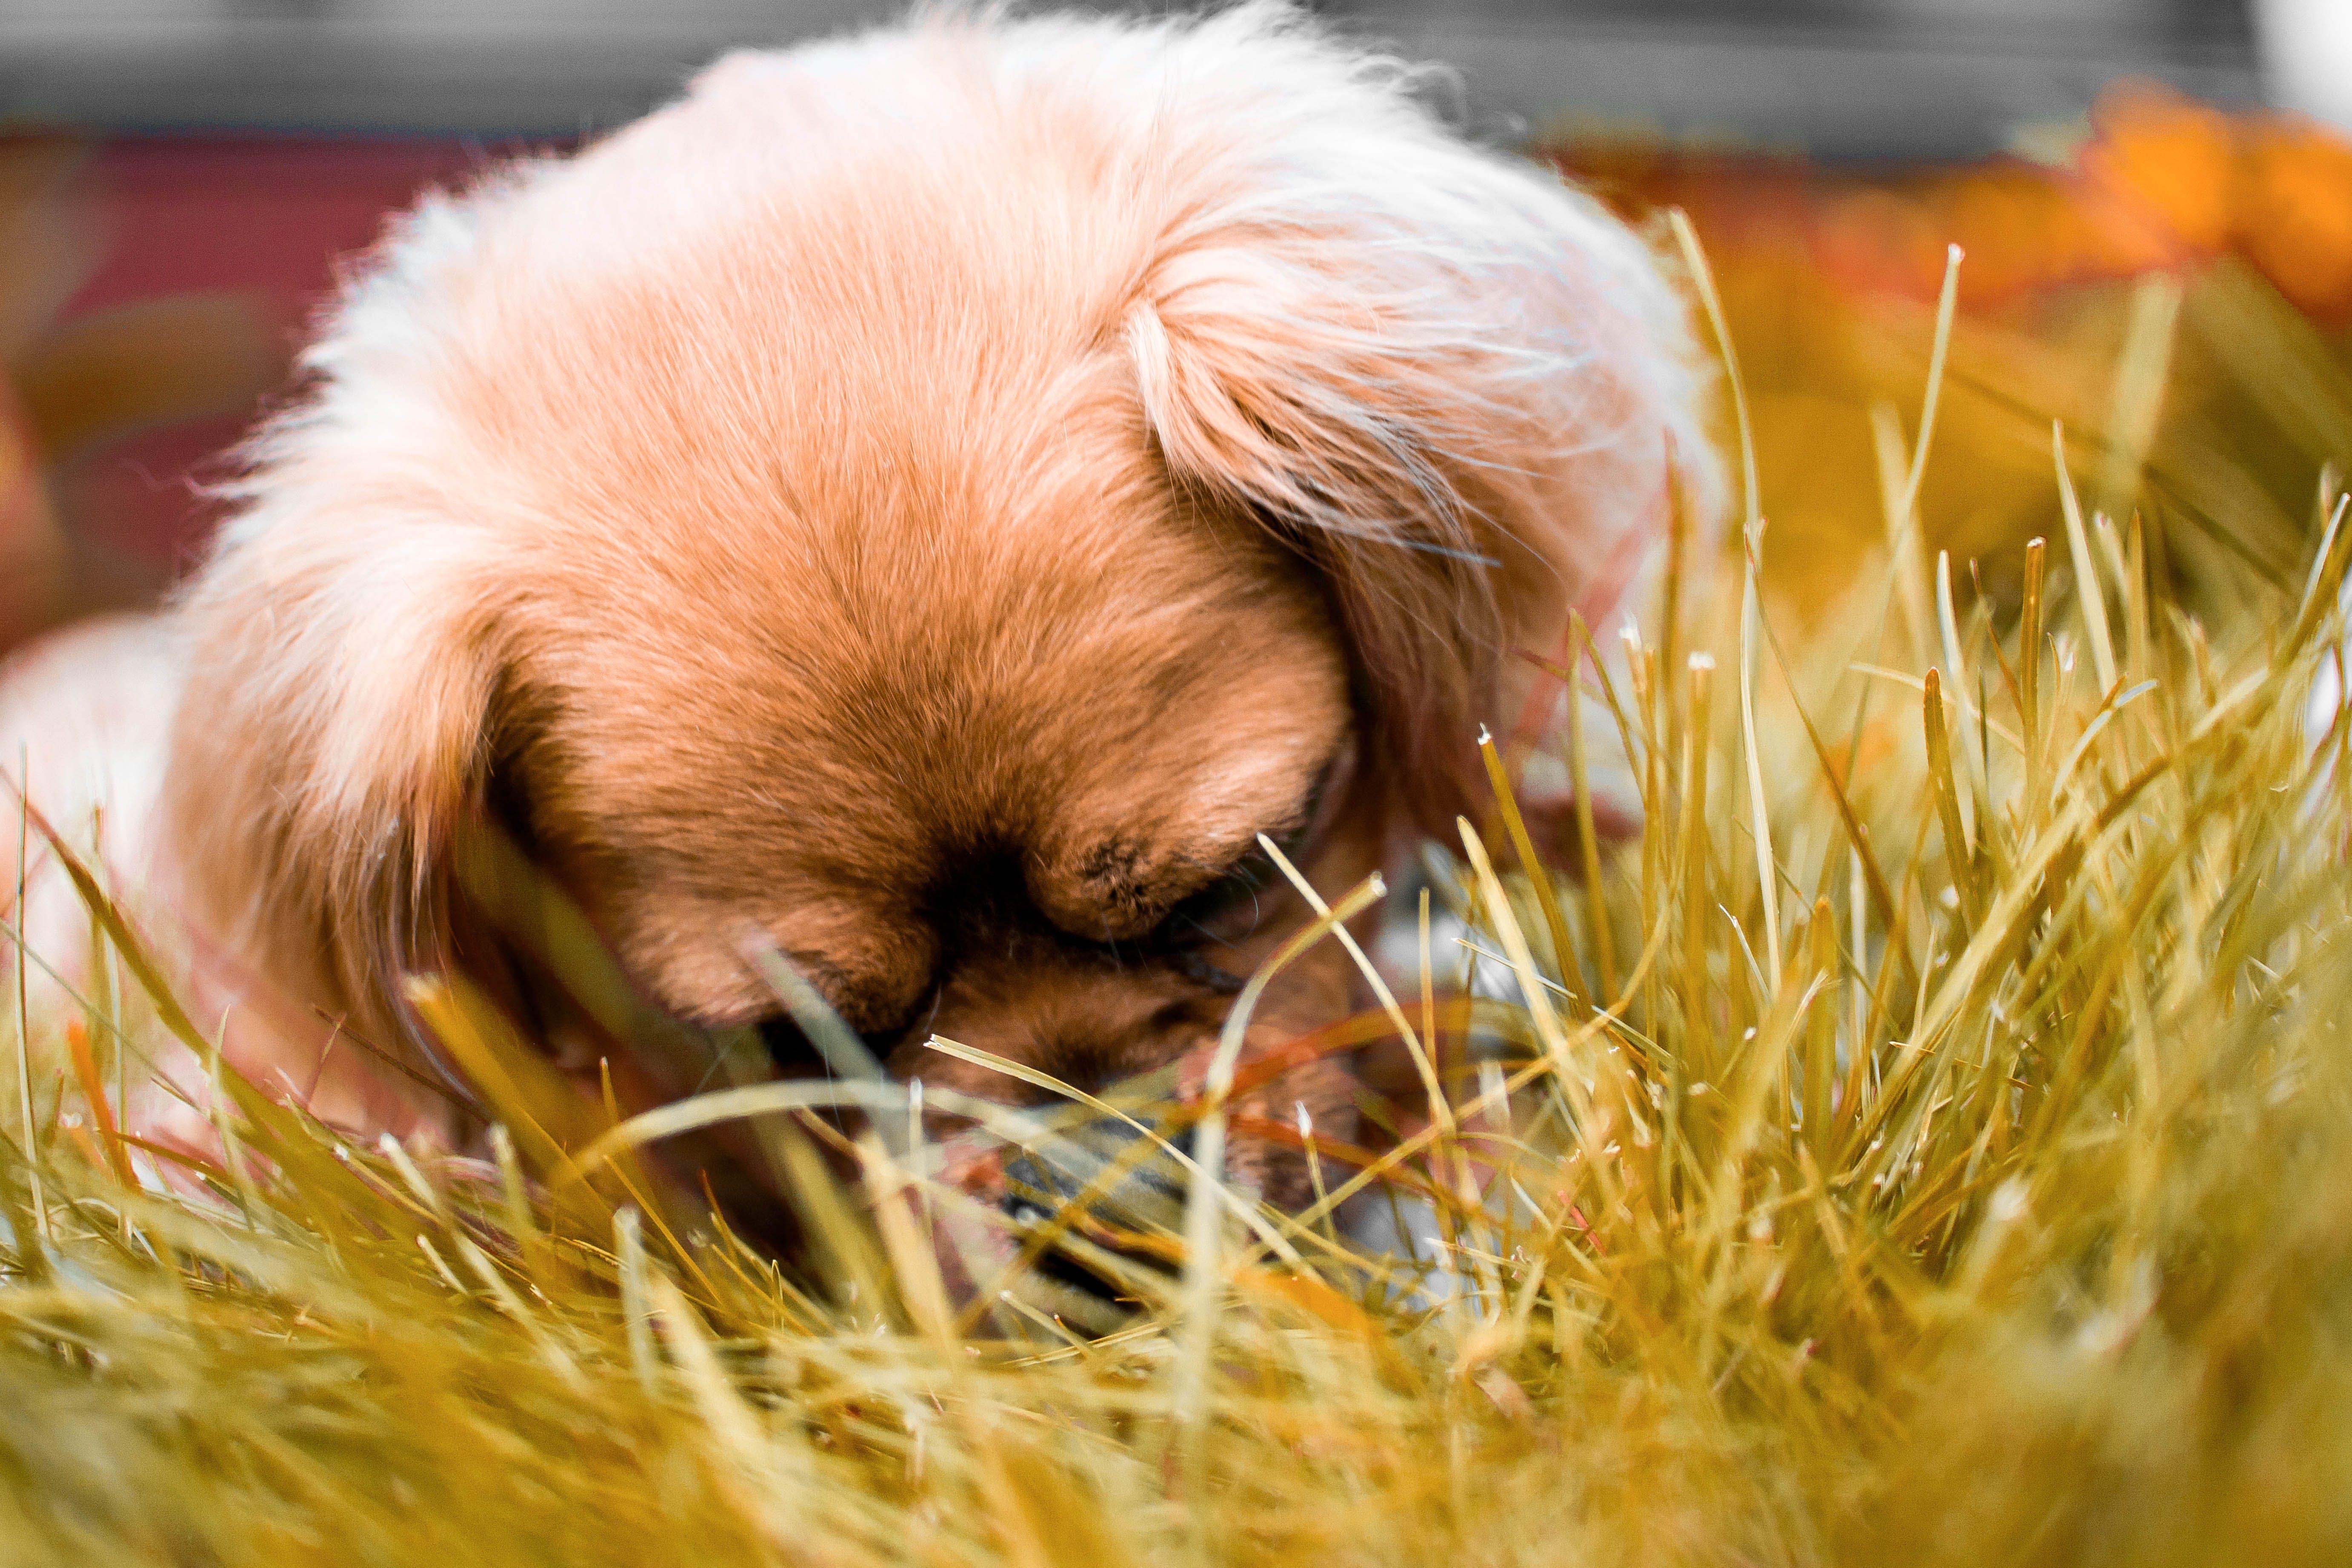 Brown Tibetan Spaniel Puppy Laying Down on Grass